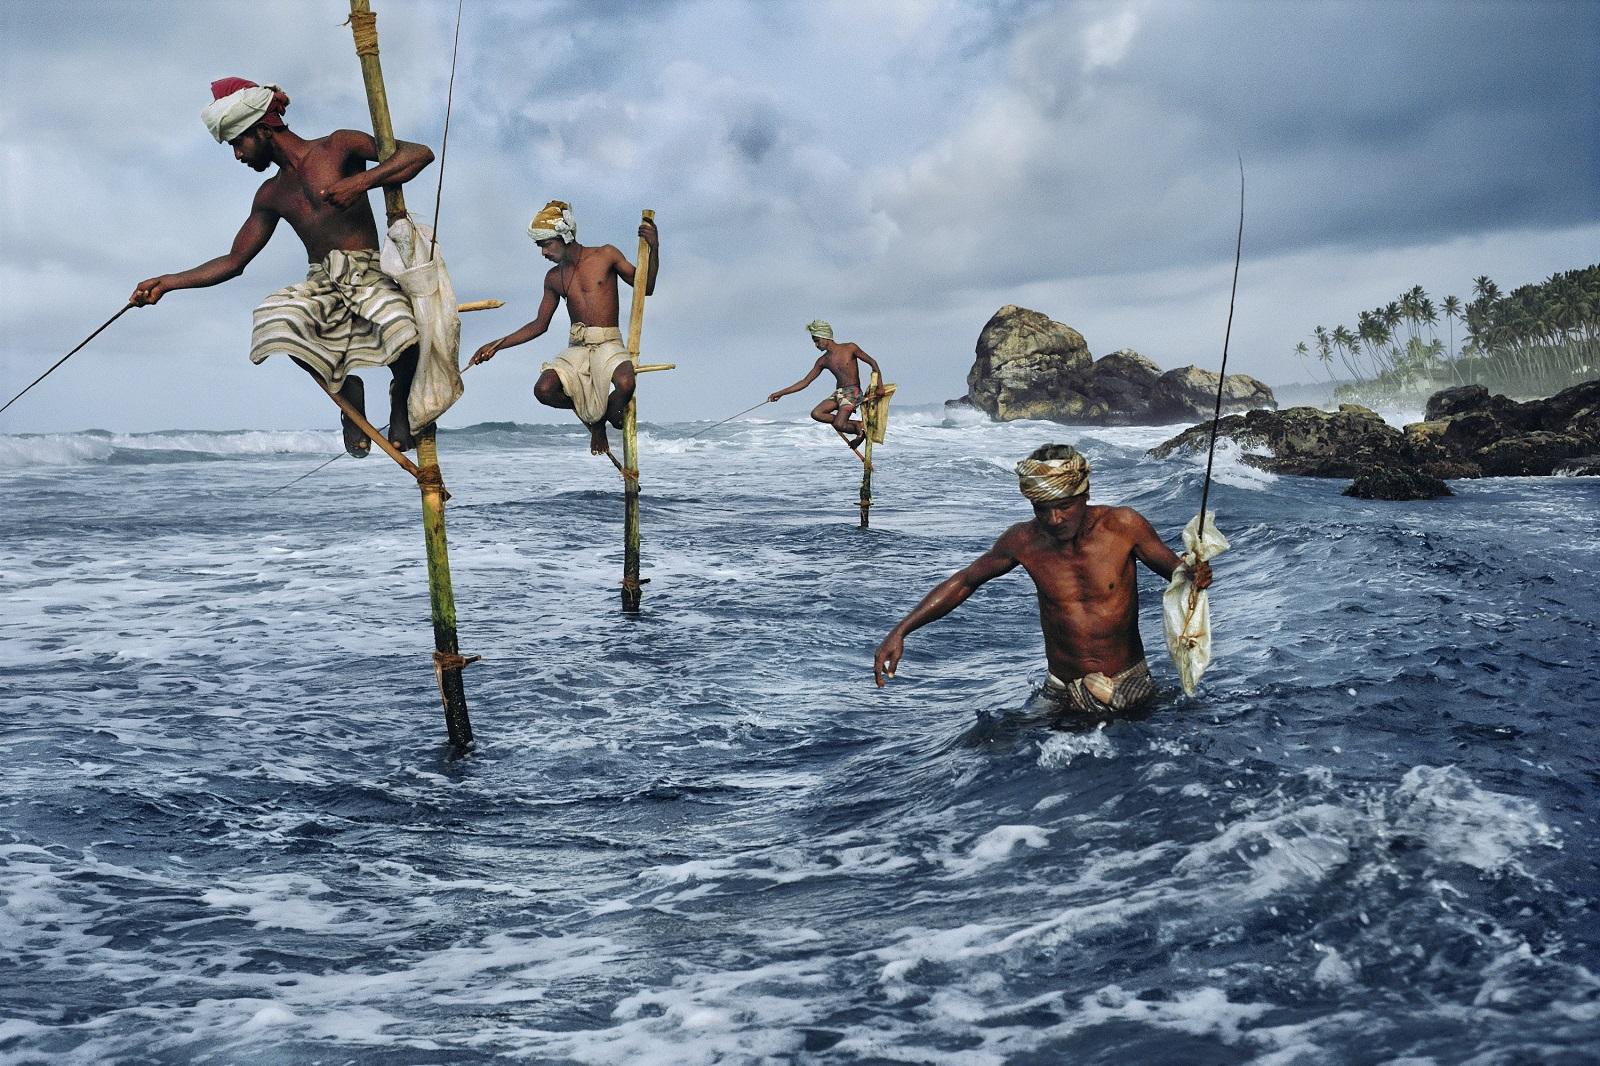 Kalastajia Sri Lankassa 1995. Kuva: Steve McCurry.